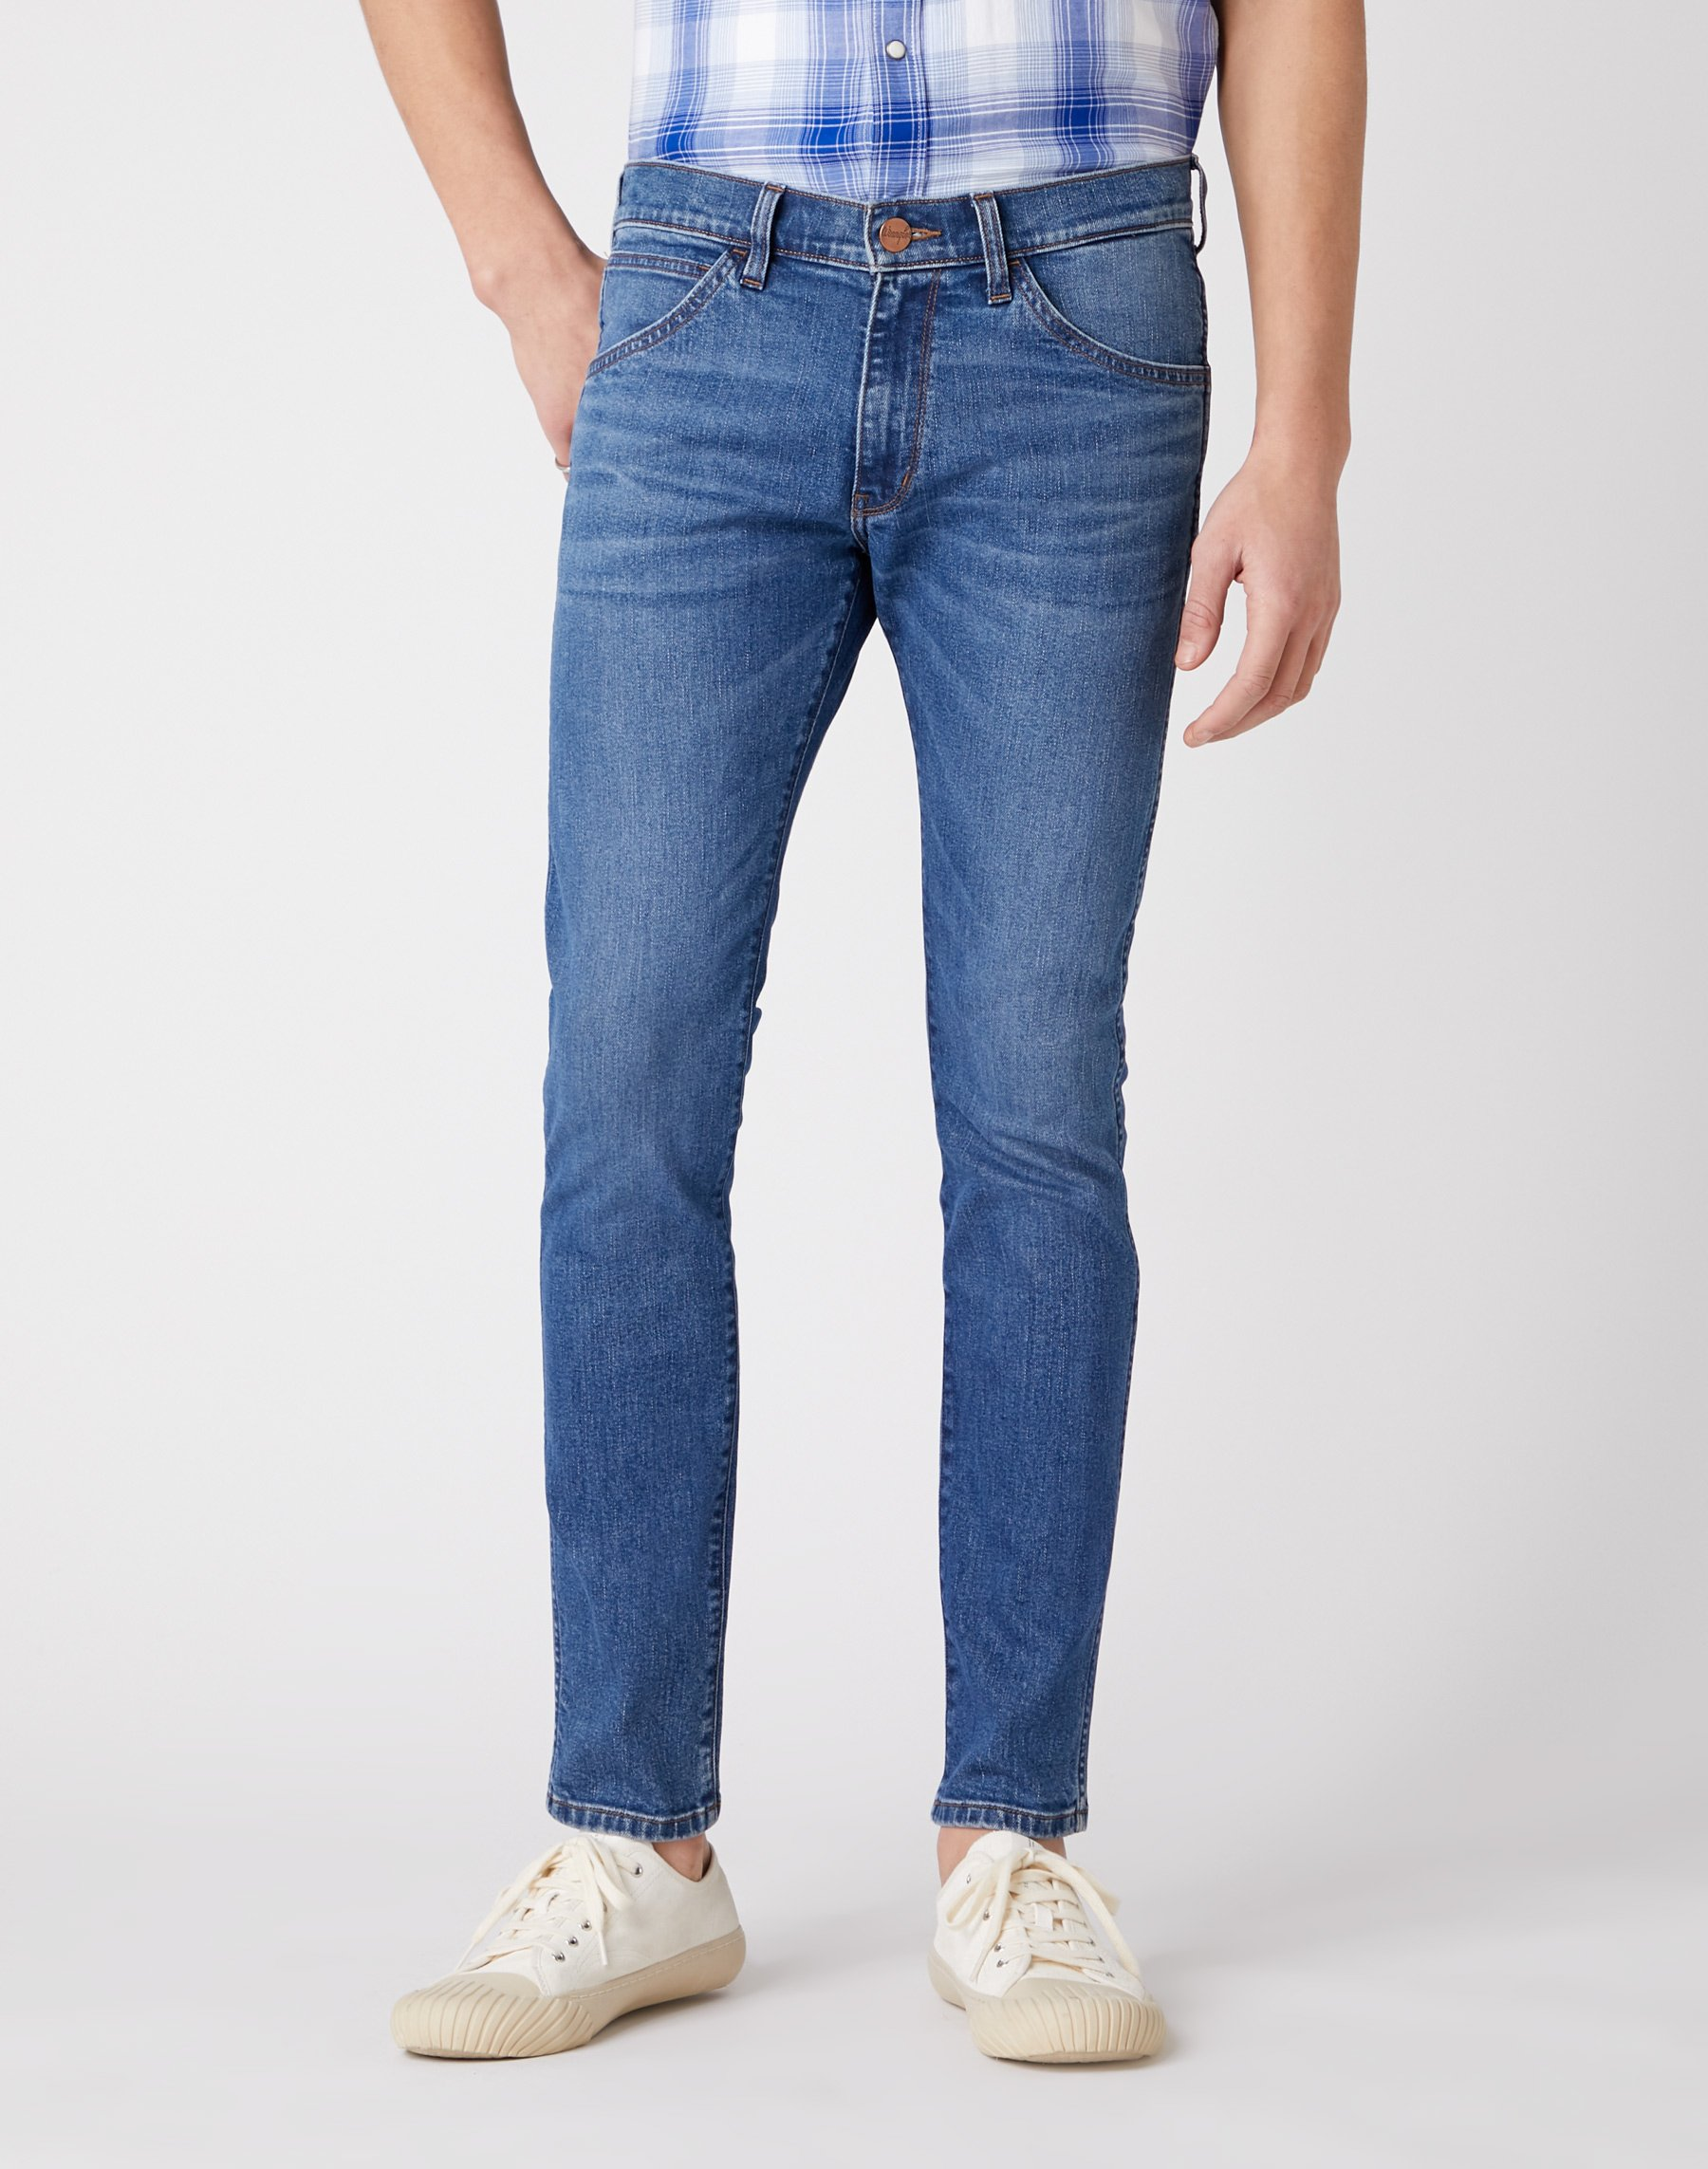 Uomo BRYSON - Jeans slim fit